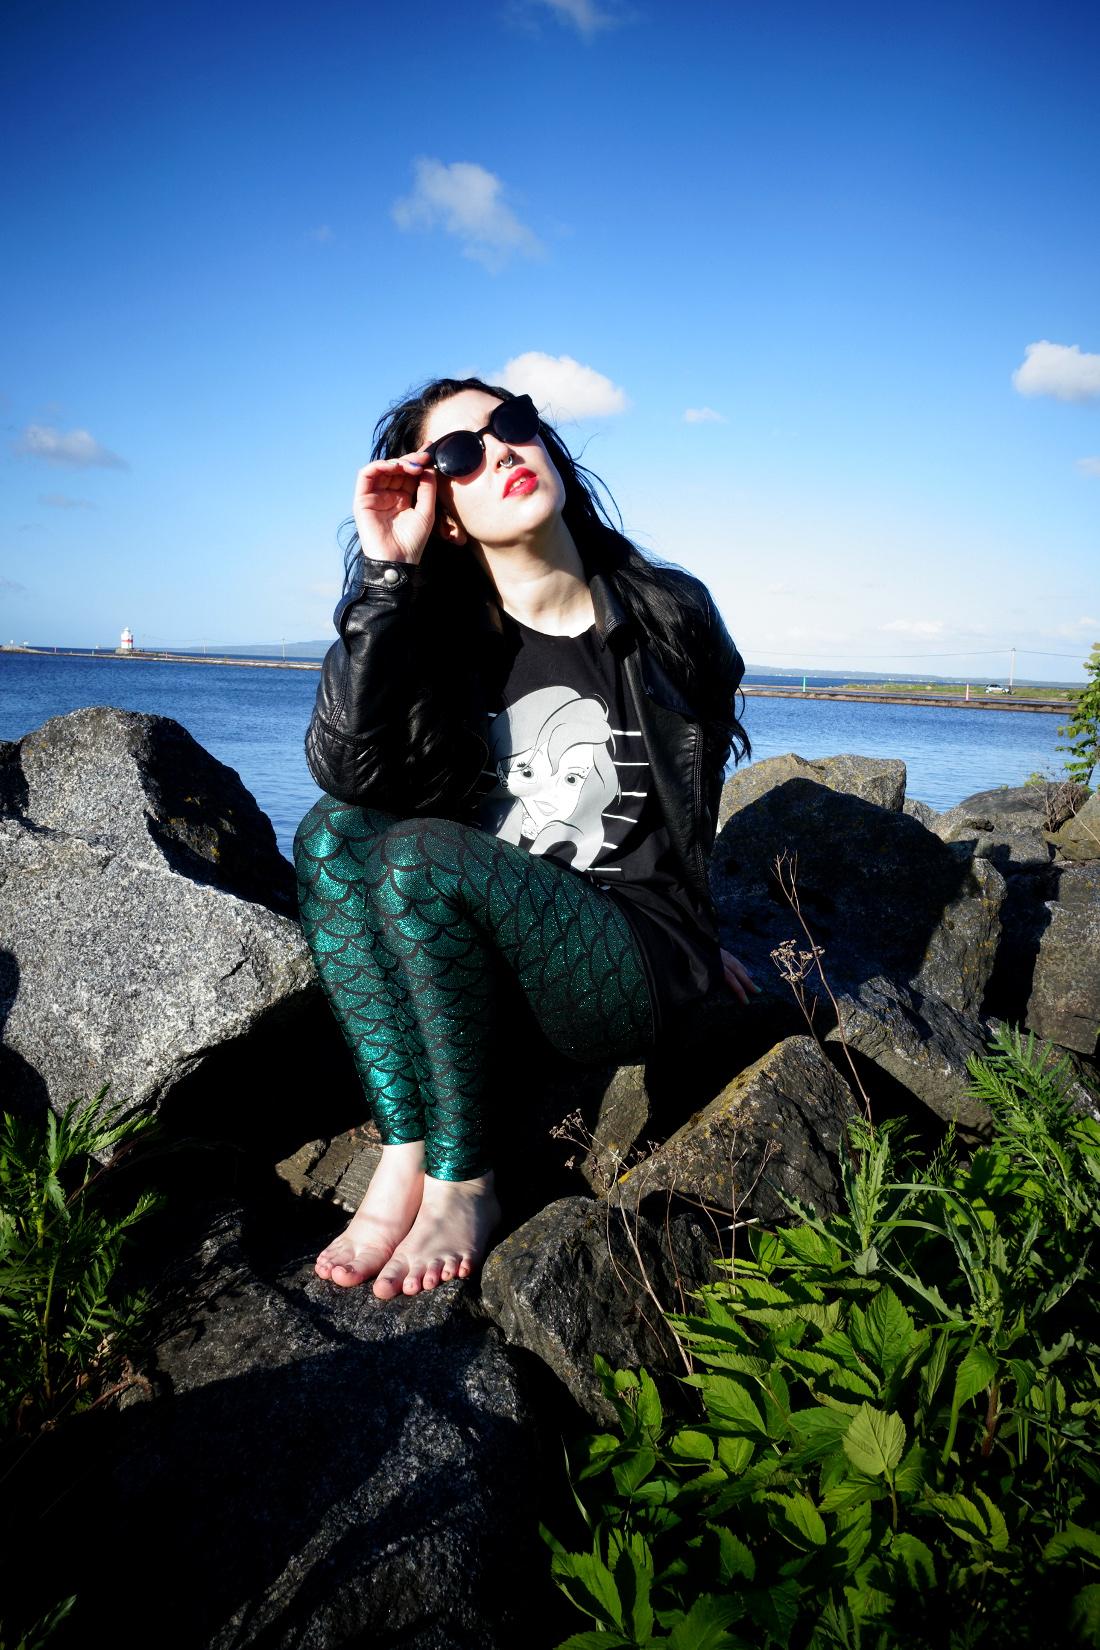 twisted apparel ariel mugshot mermaid t shirt, green mermaid leggings